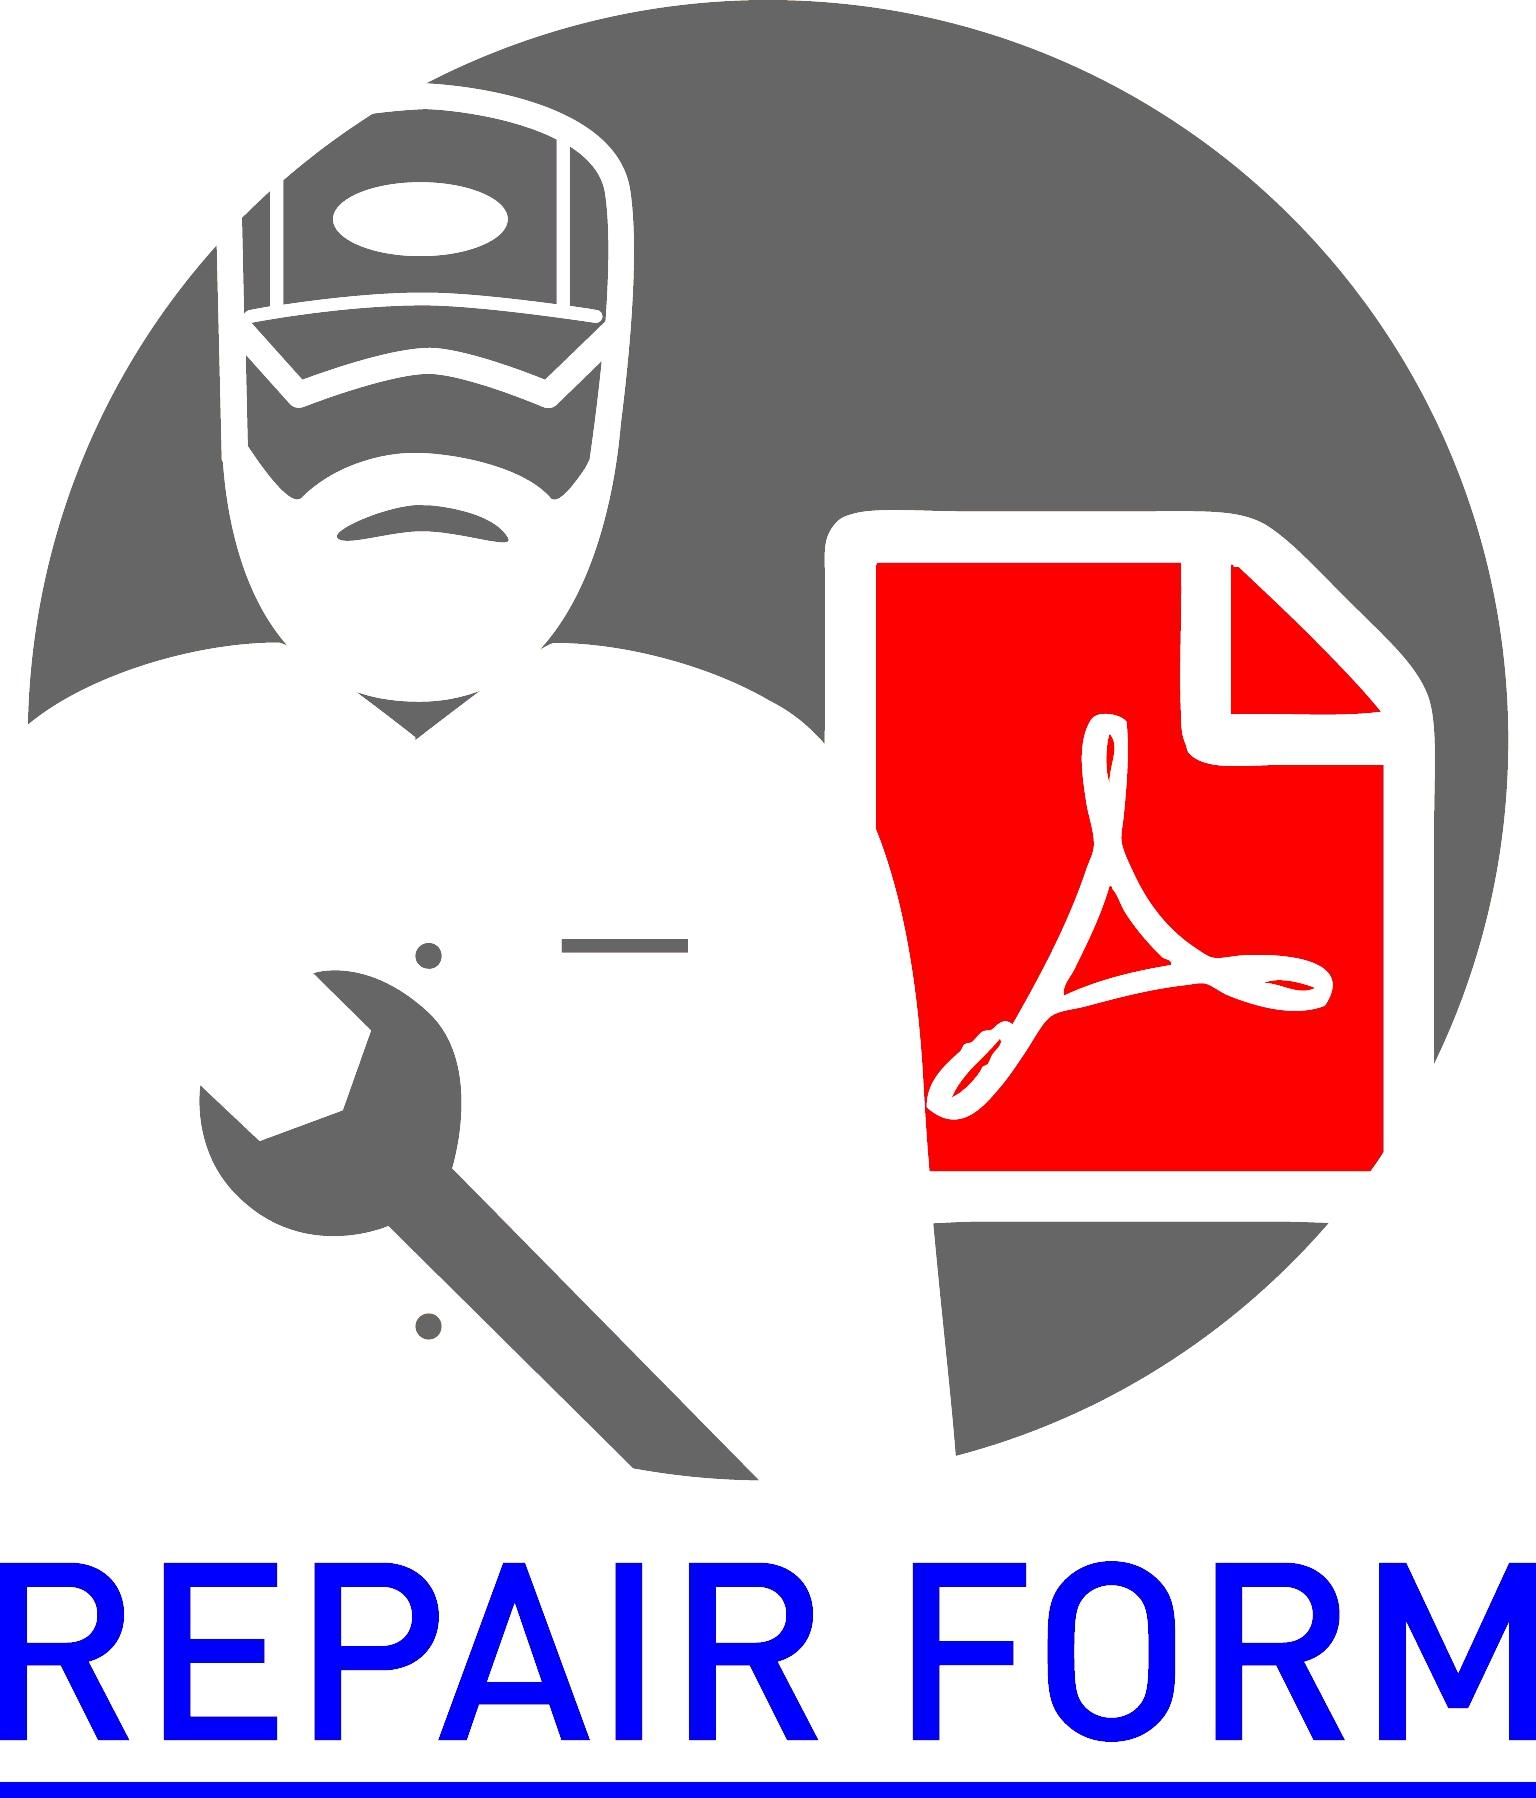 repairform-icon.jpg